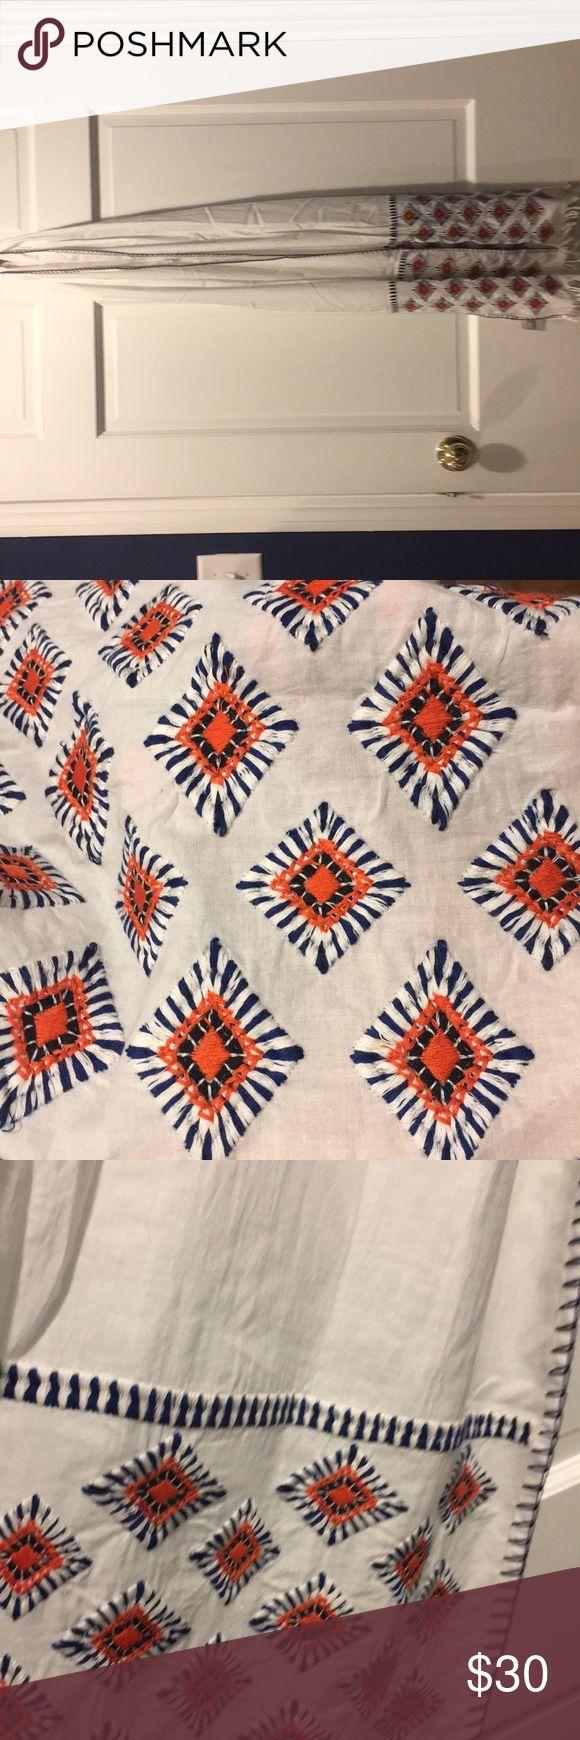 Jcrew NWT white blue and orange scarf Jcrew NWT white blue and orange scarf J. Crew Accessories Scarves & Wraps